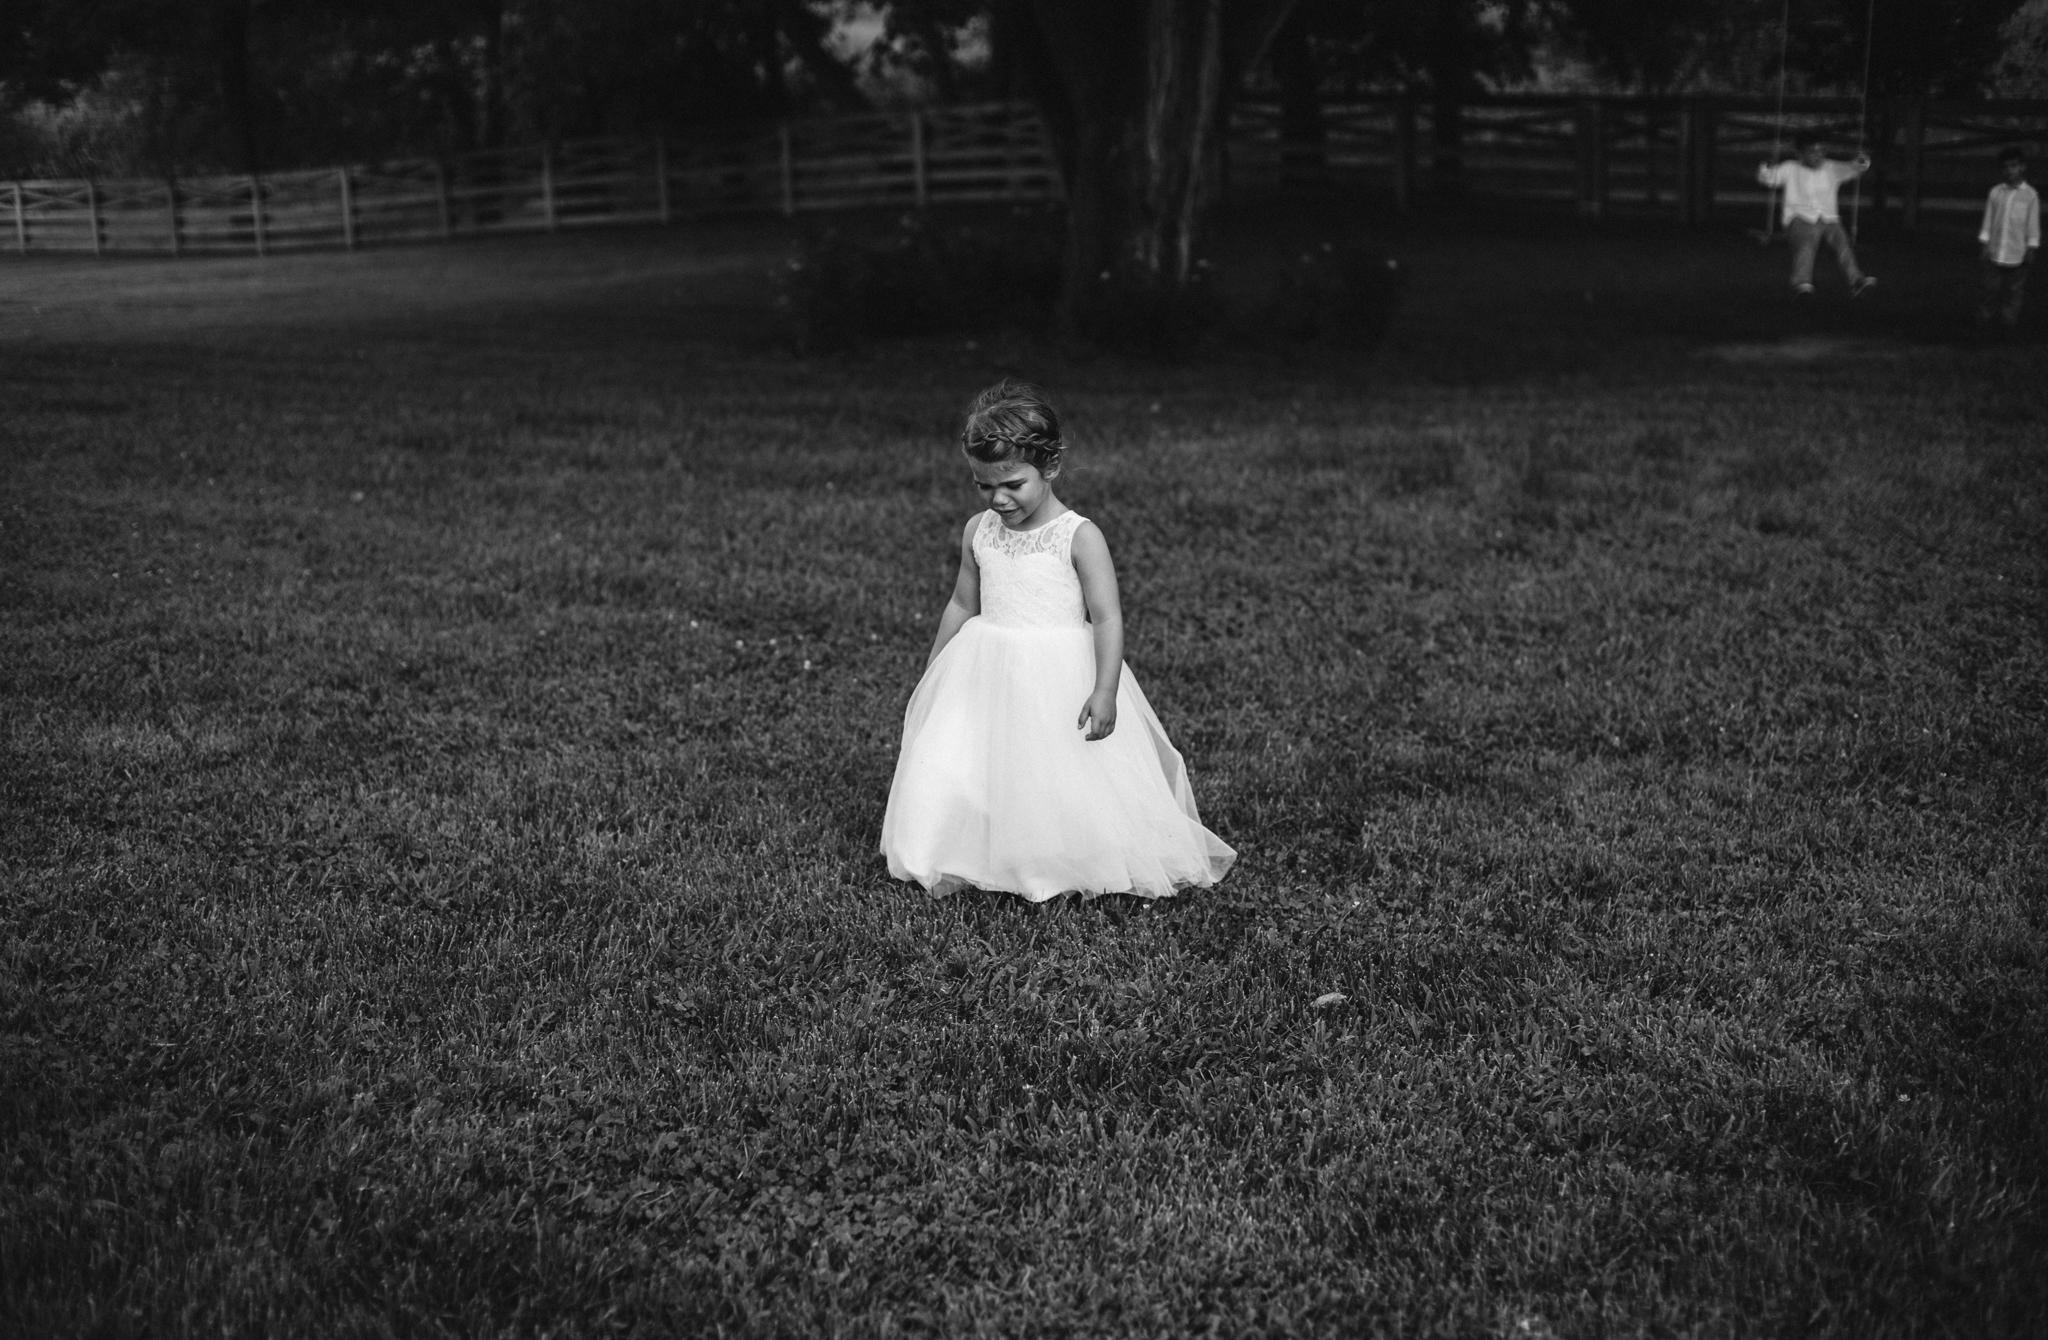 rebeccaburtphotography.walkersoverlook.frederickmarylandweddingphotographer-115.JPG